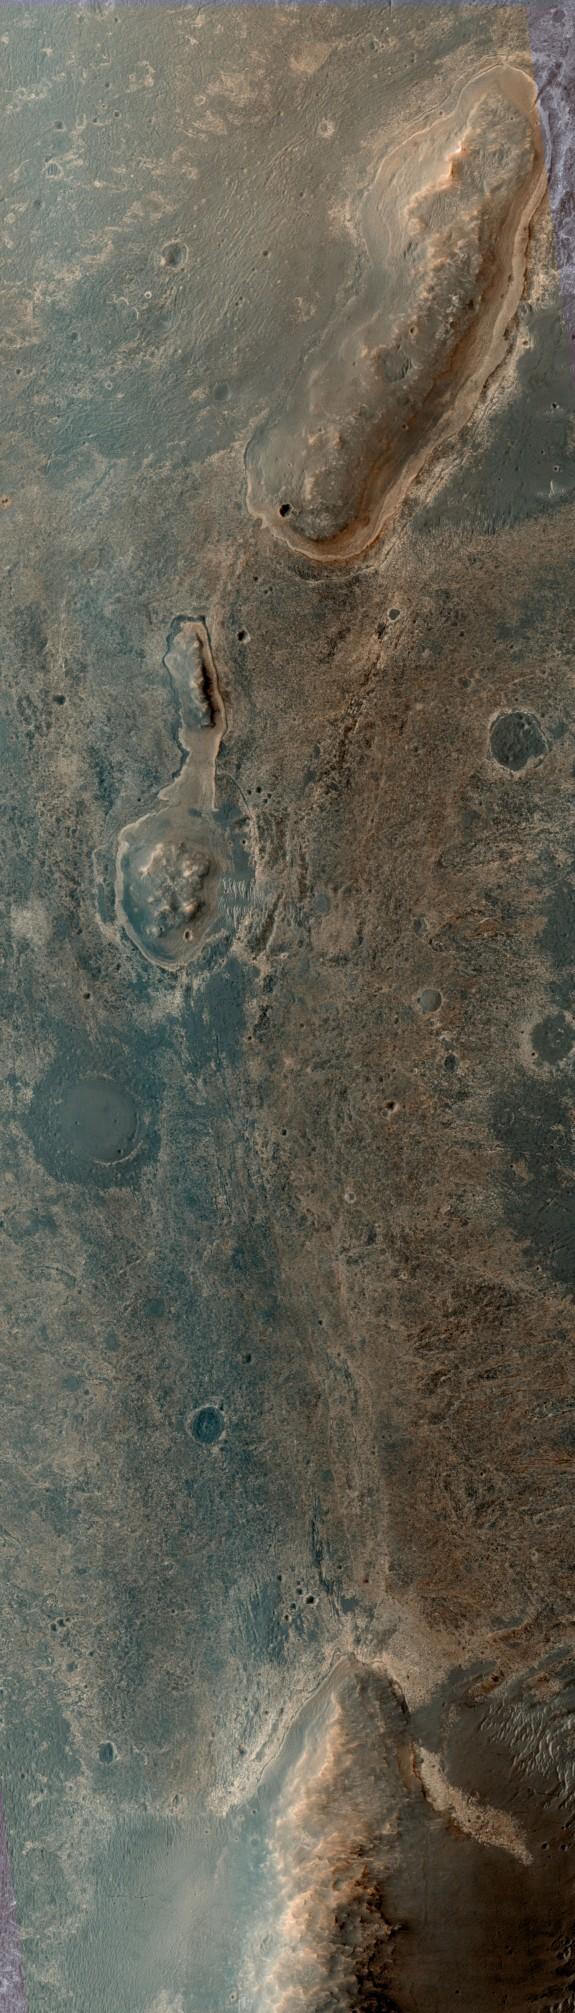 The full HiRISE photo